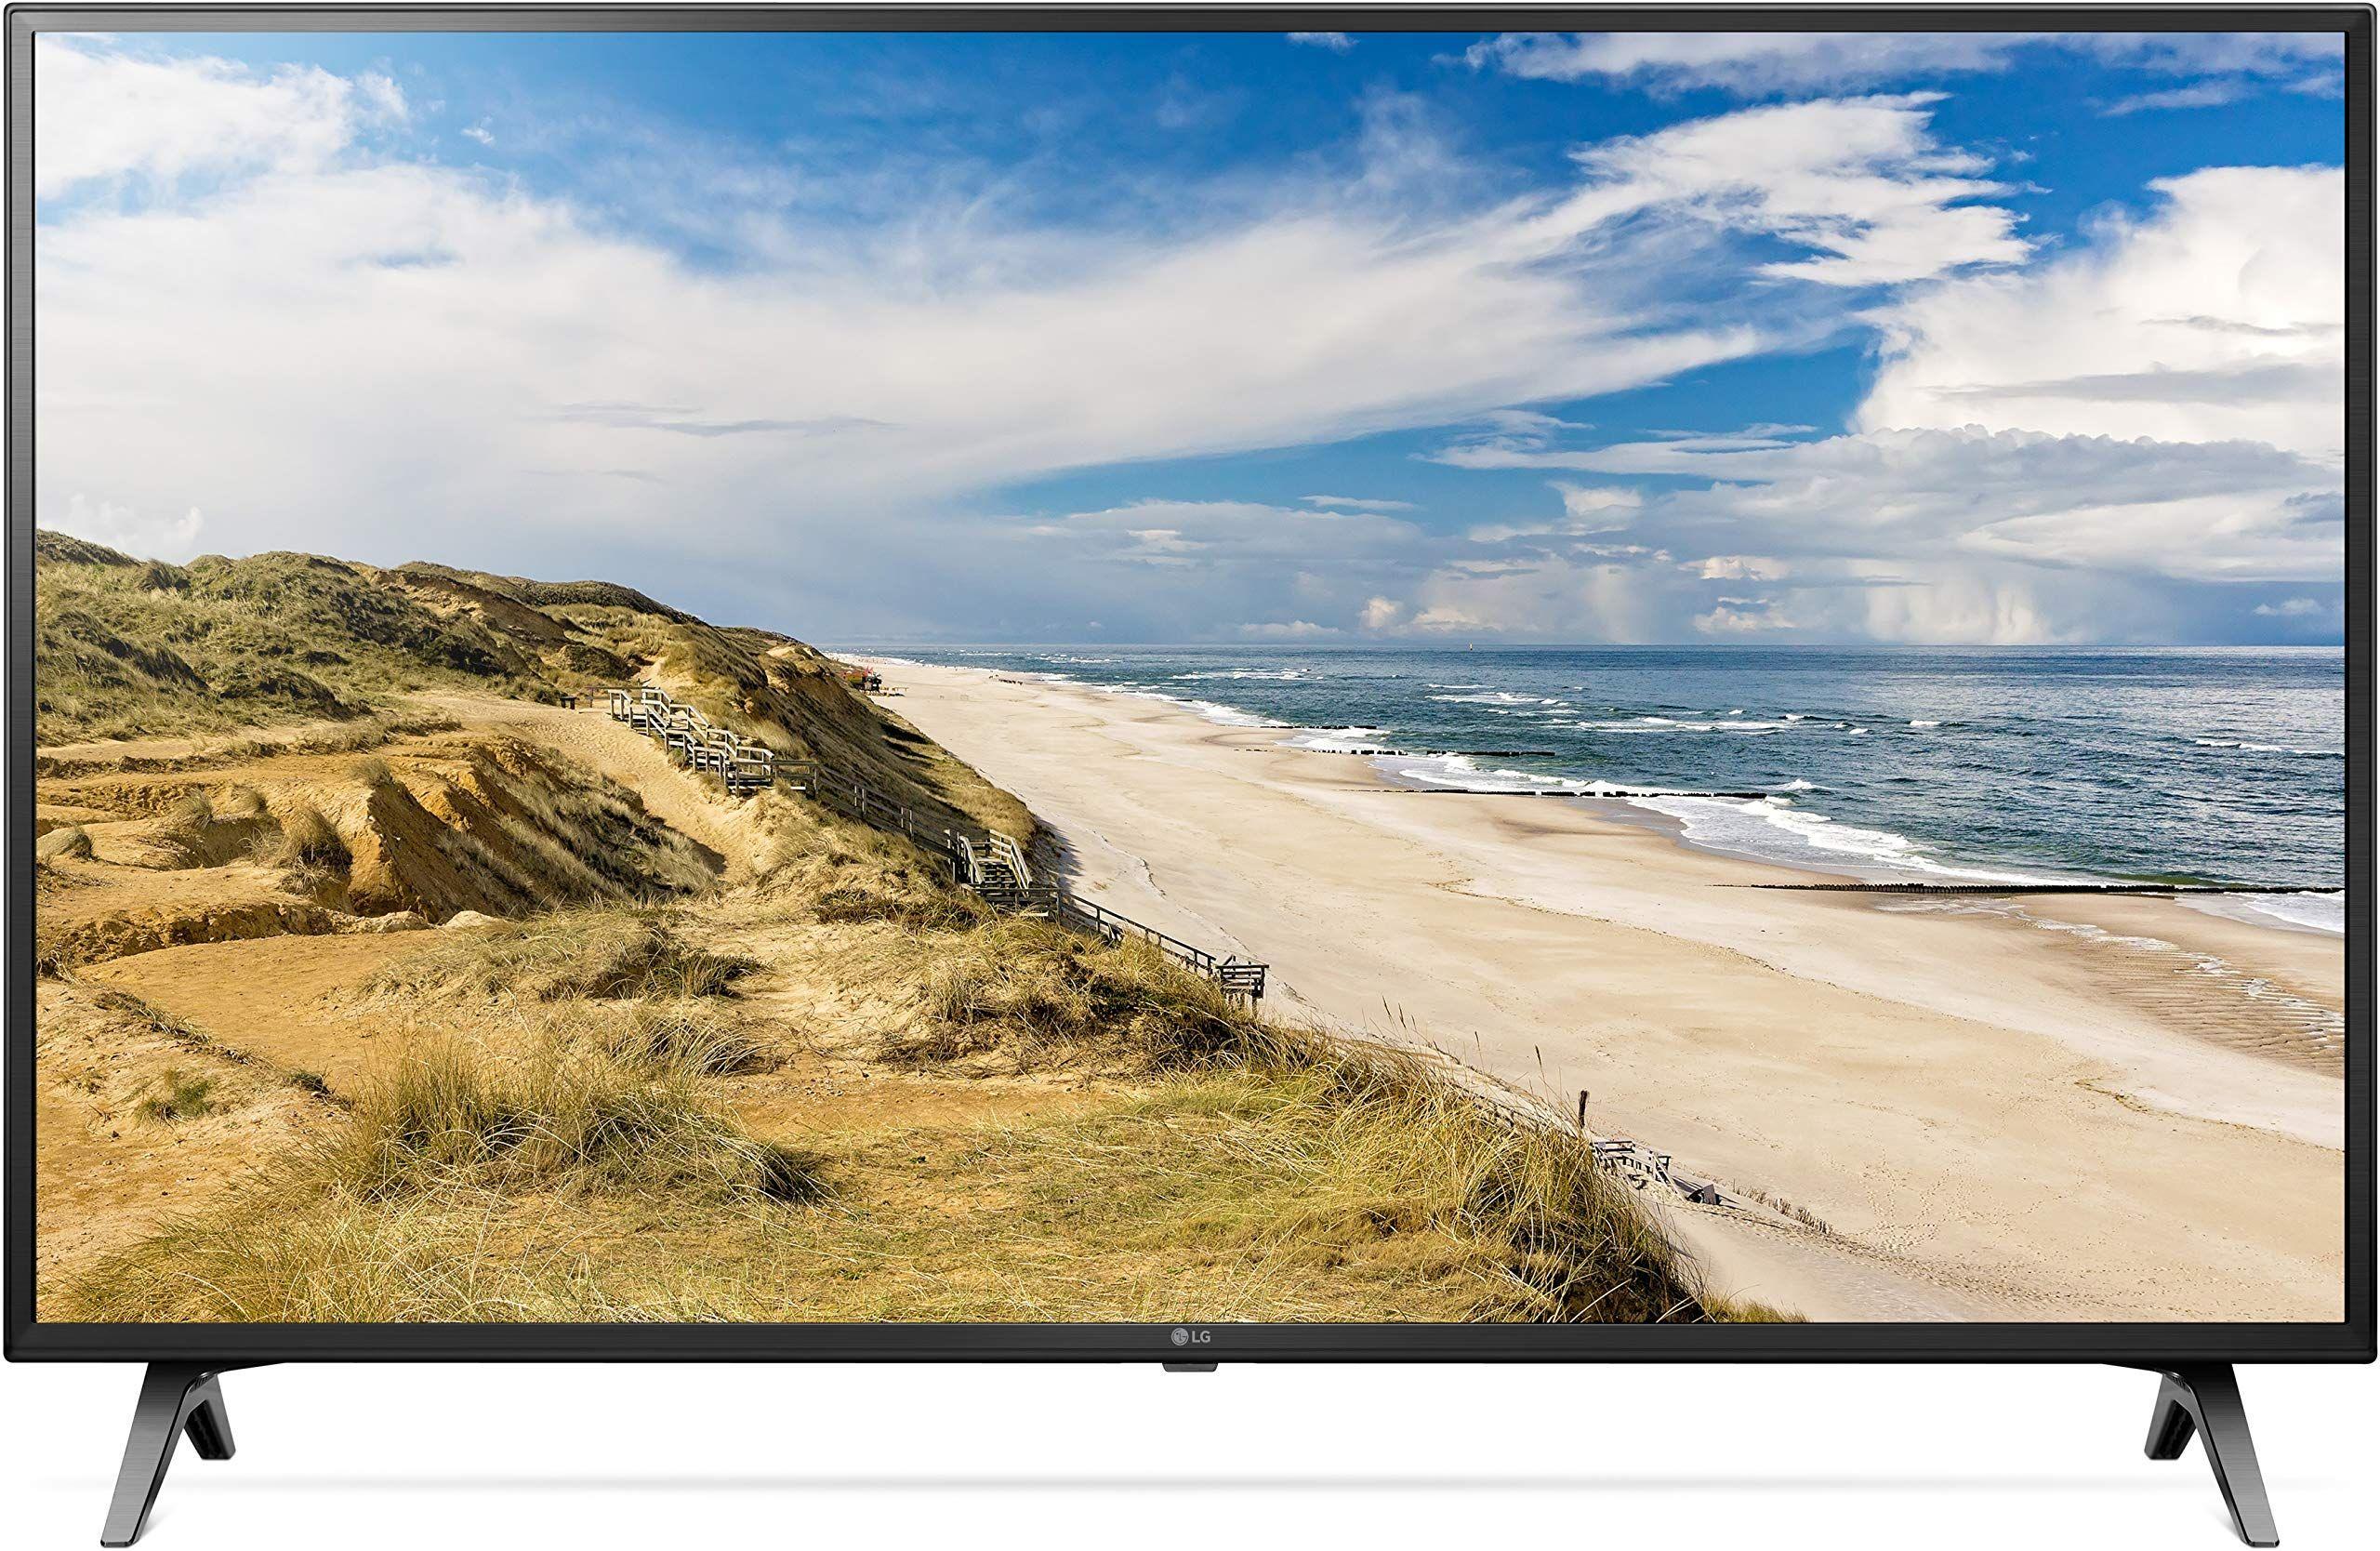 Lg 55um71007lb 139 Cm 55 Zoll Fernseher Uhd Triple Tuner 4k Active Hdr Smart Tv Mit Alexa Integration In 2020 Led Fernseher Fernseher Tv Empfang